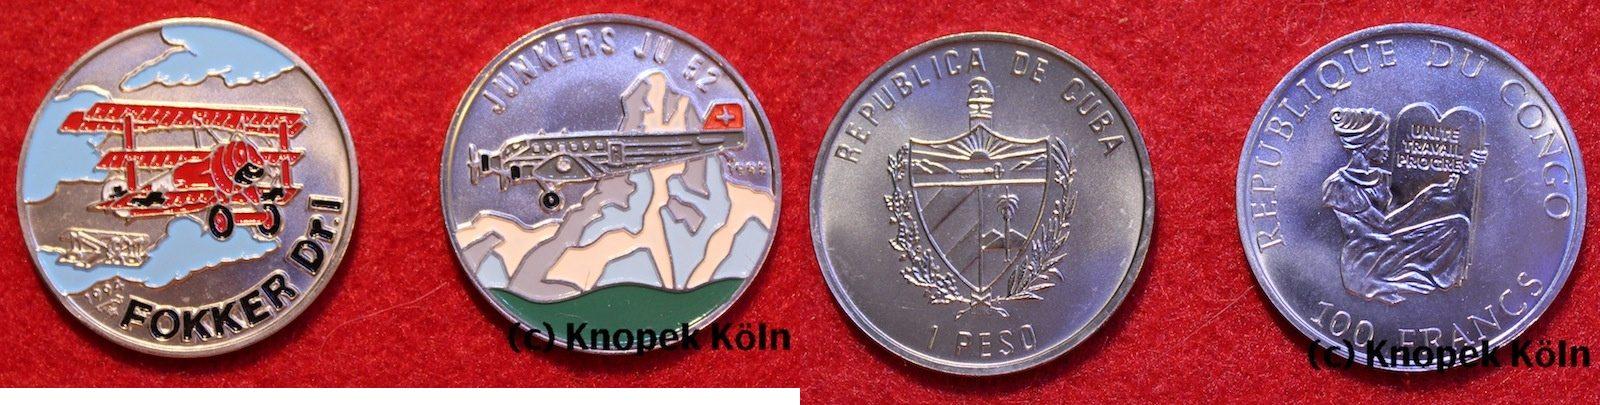 Lot 2 Farbmünzen Flugzeuge Junkers Ju 52/fokker Dr I Dr1 Kuba Lot 2x